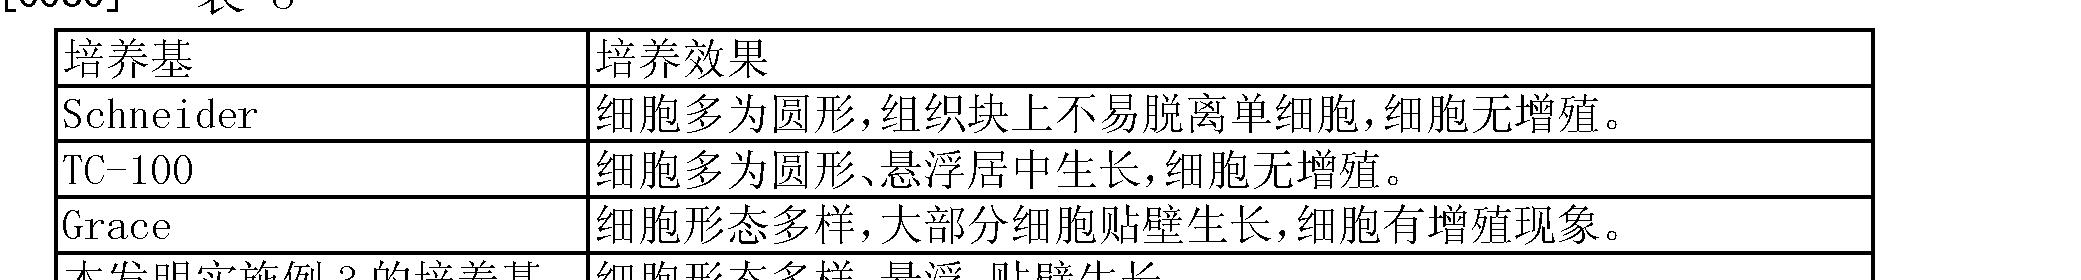 Figure CN102776148AD00122